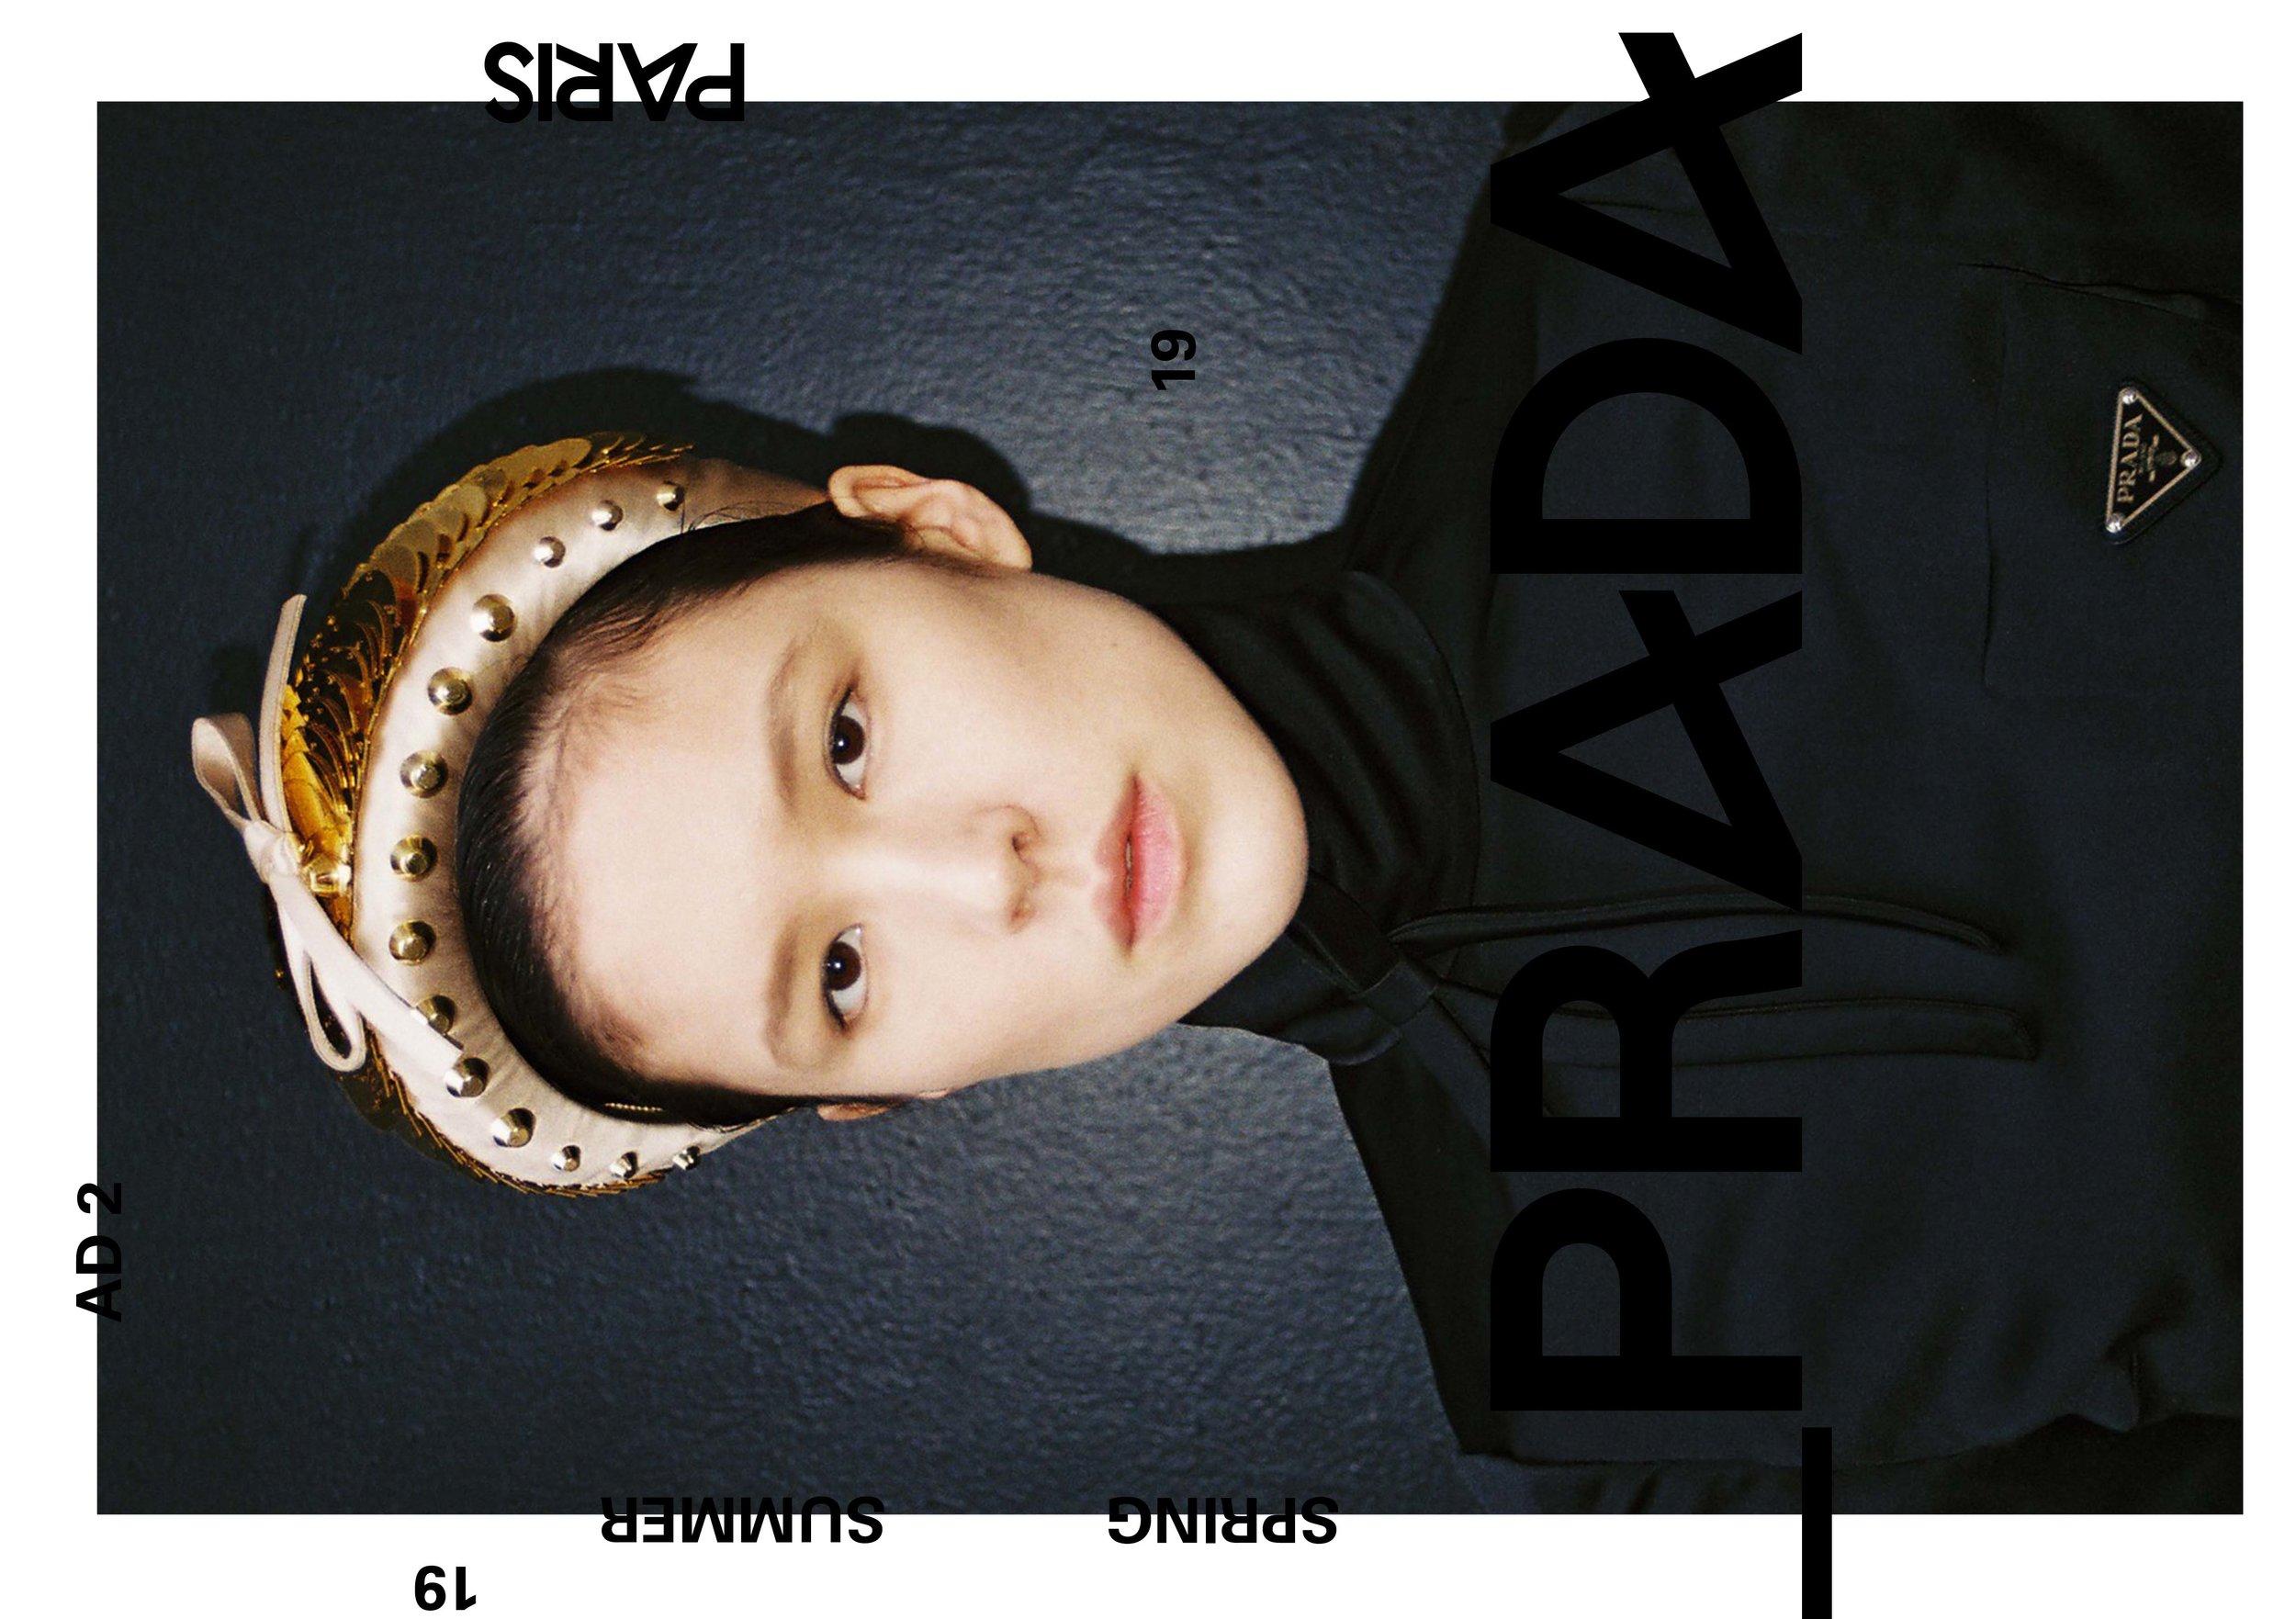 prada_2_web.jpg